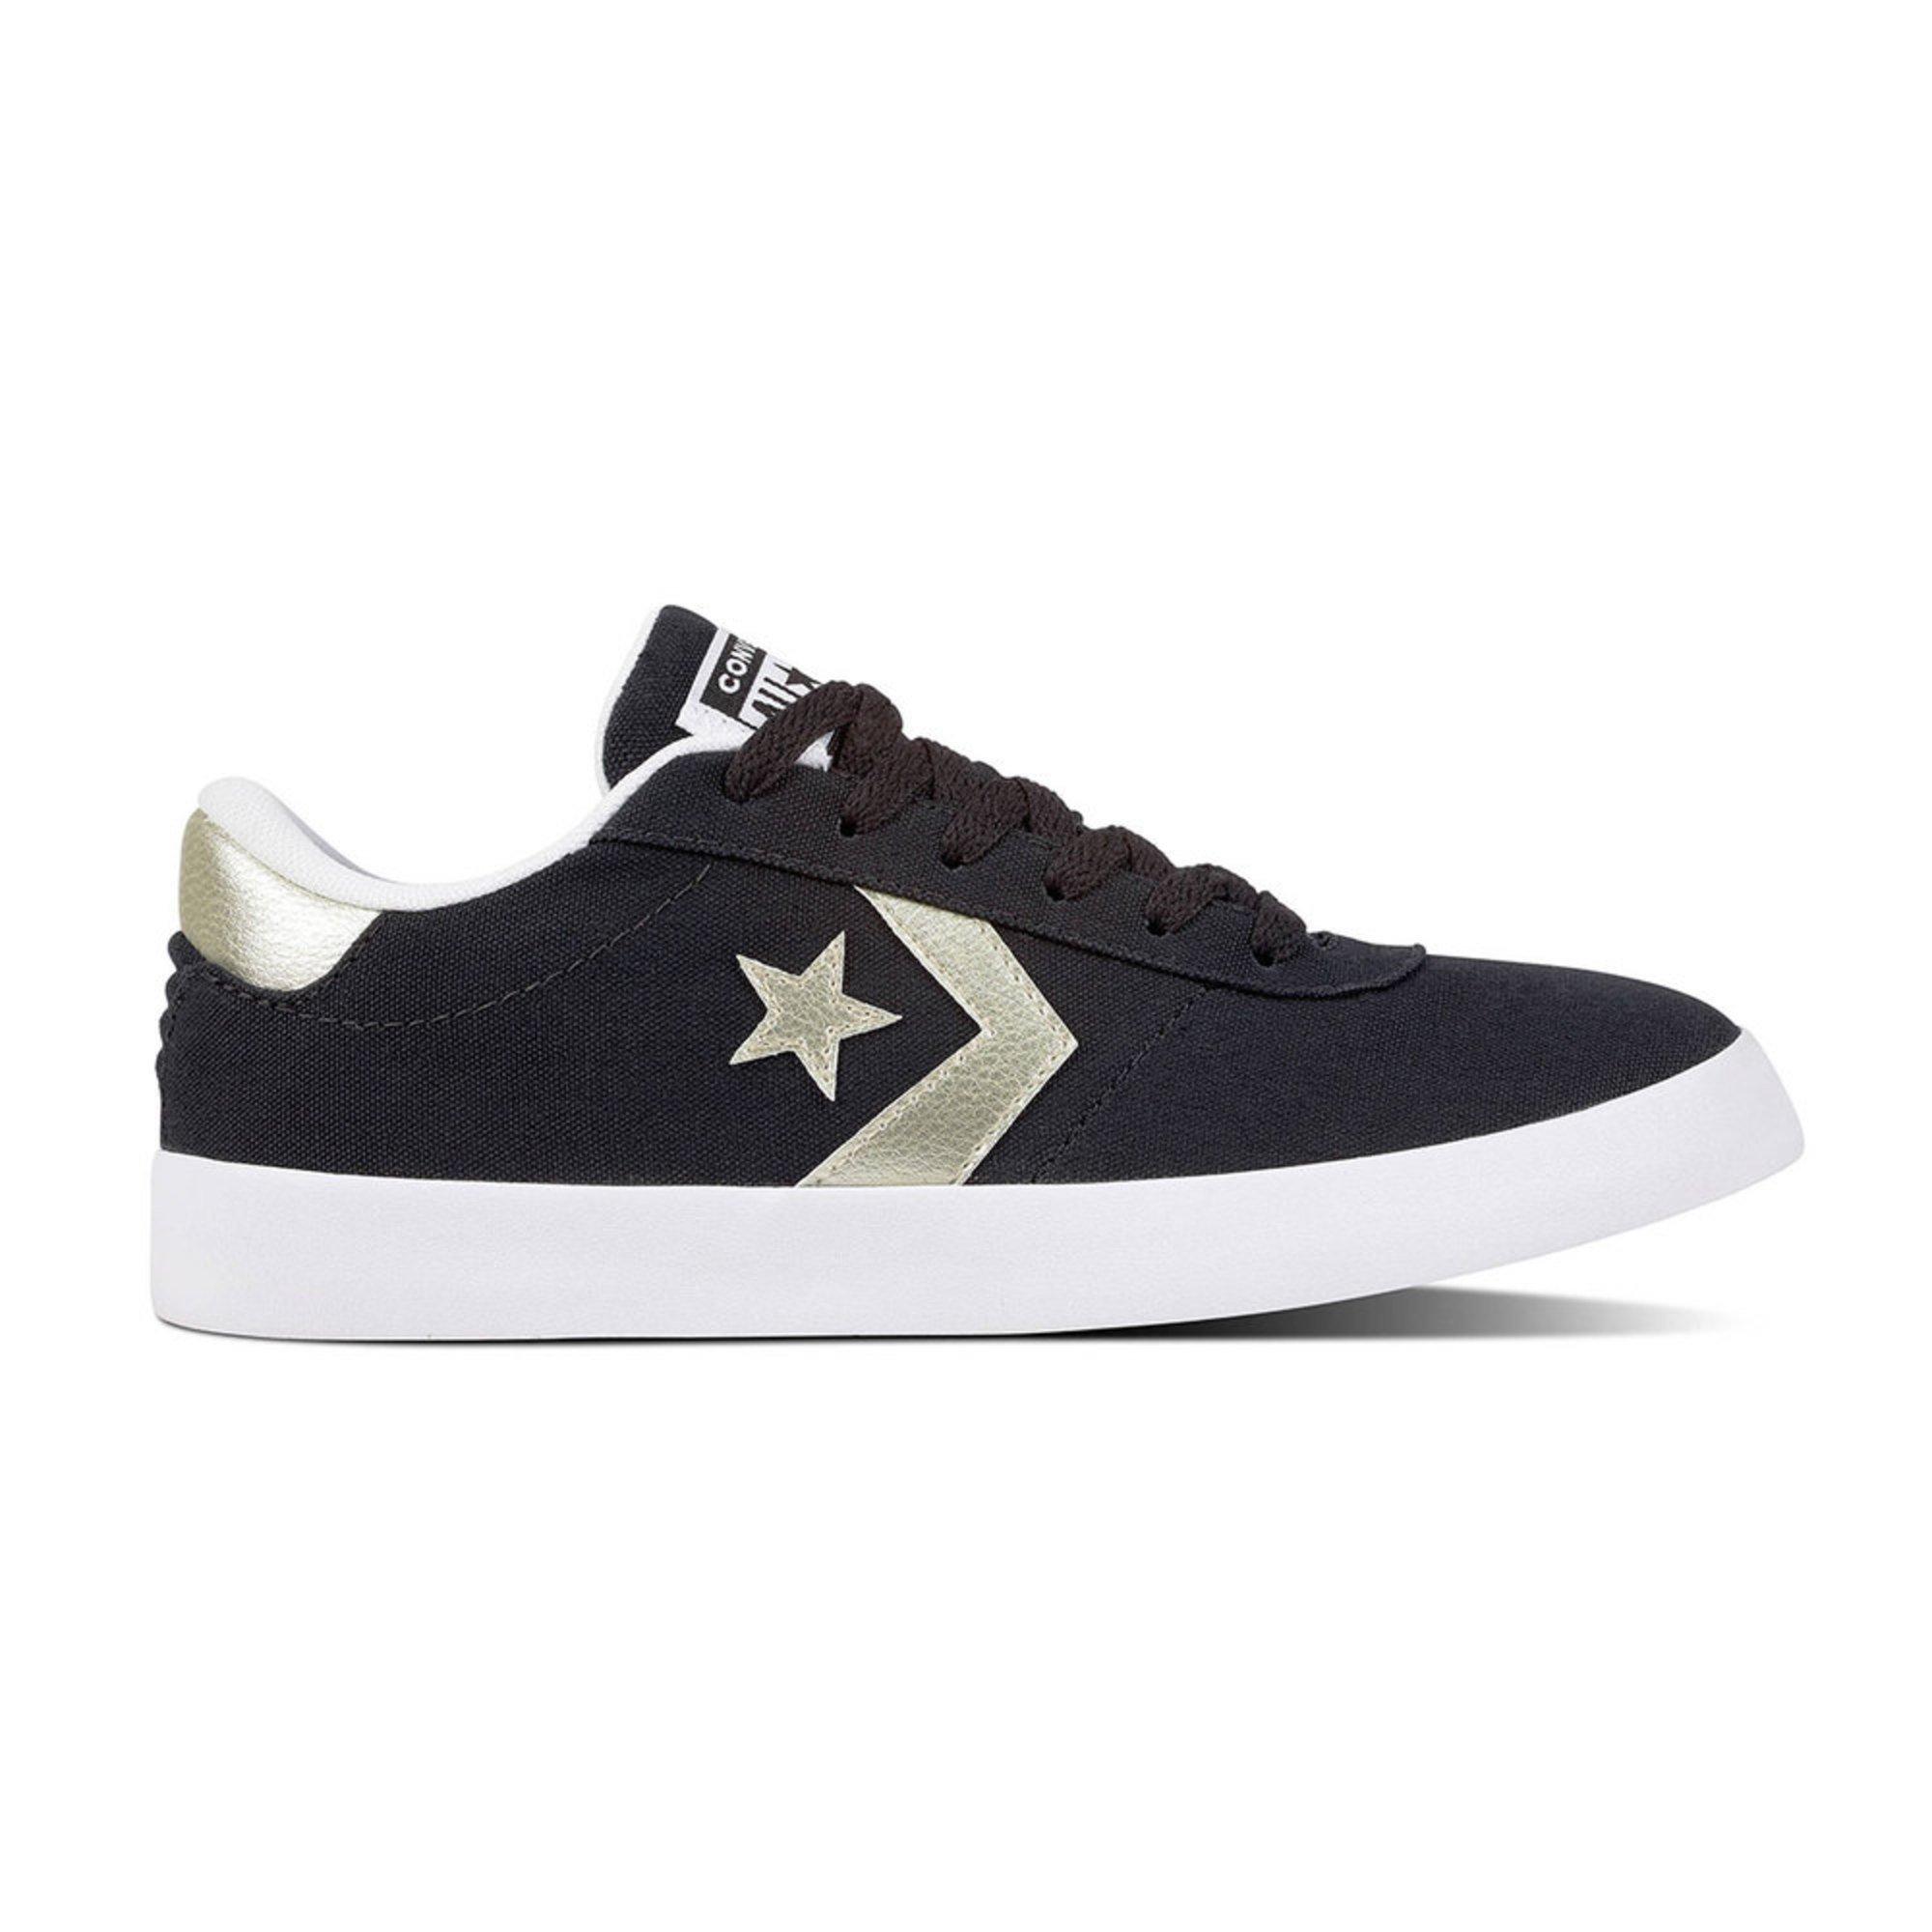 Converse Women s Point Star Low Top Sneaker  a7d7f9c64